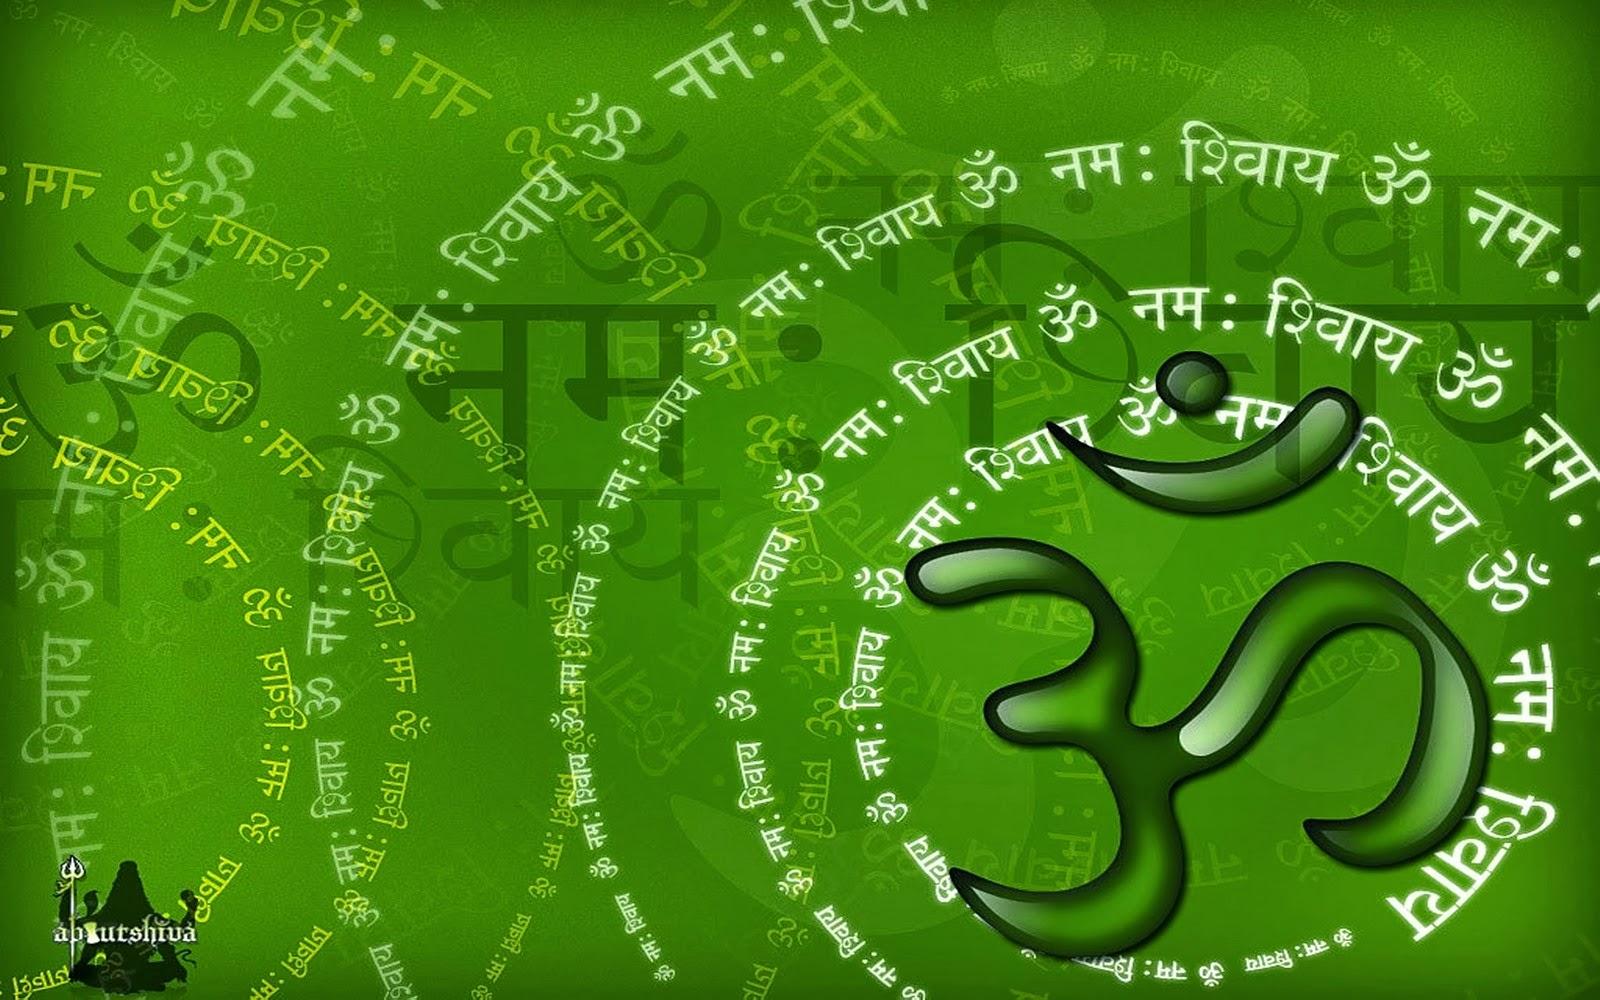 hd wallpaper | om hindu god hd wallpaper ~ hd wallpapers, high